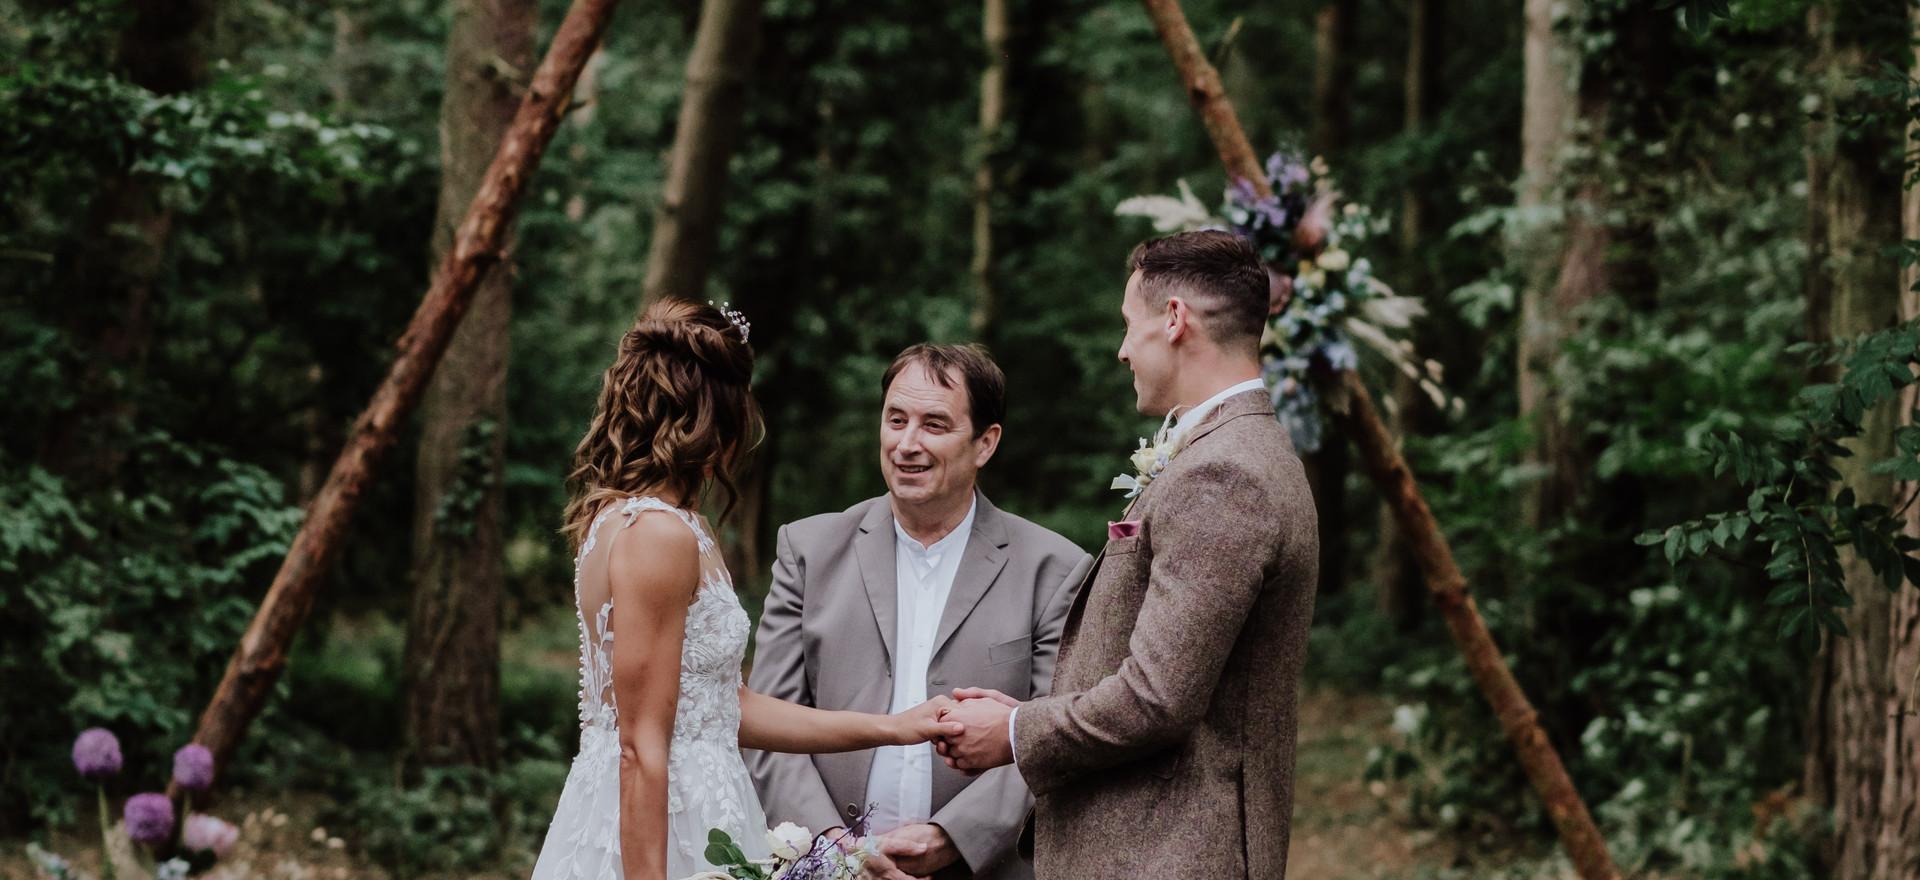 194 Lee Glasgow Wedding Photographer.jpg